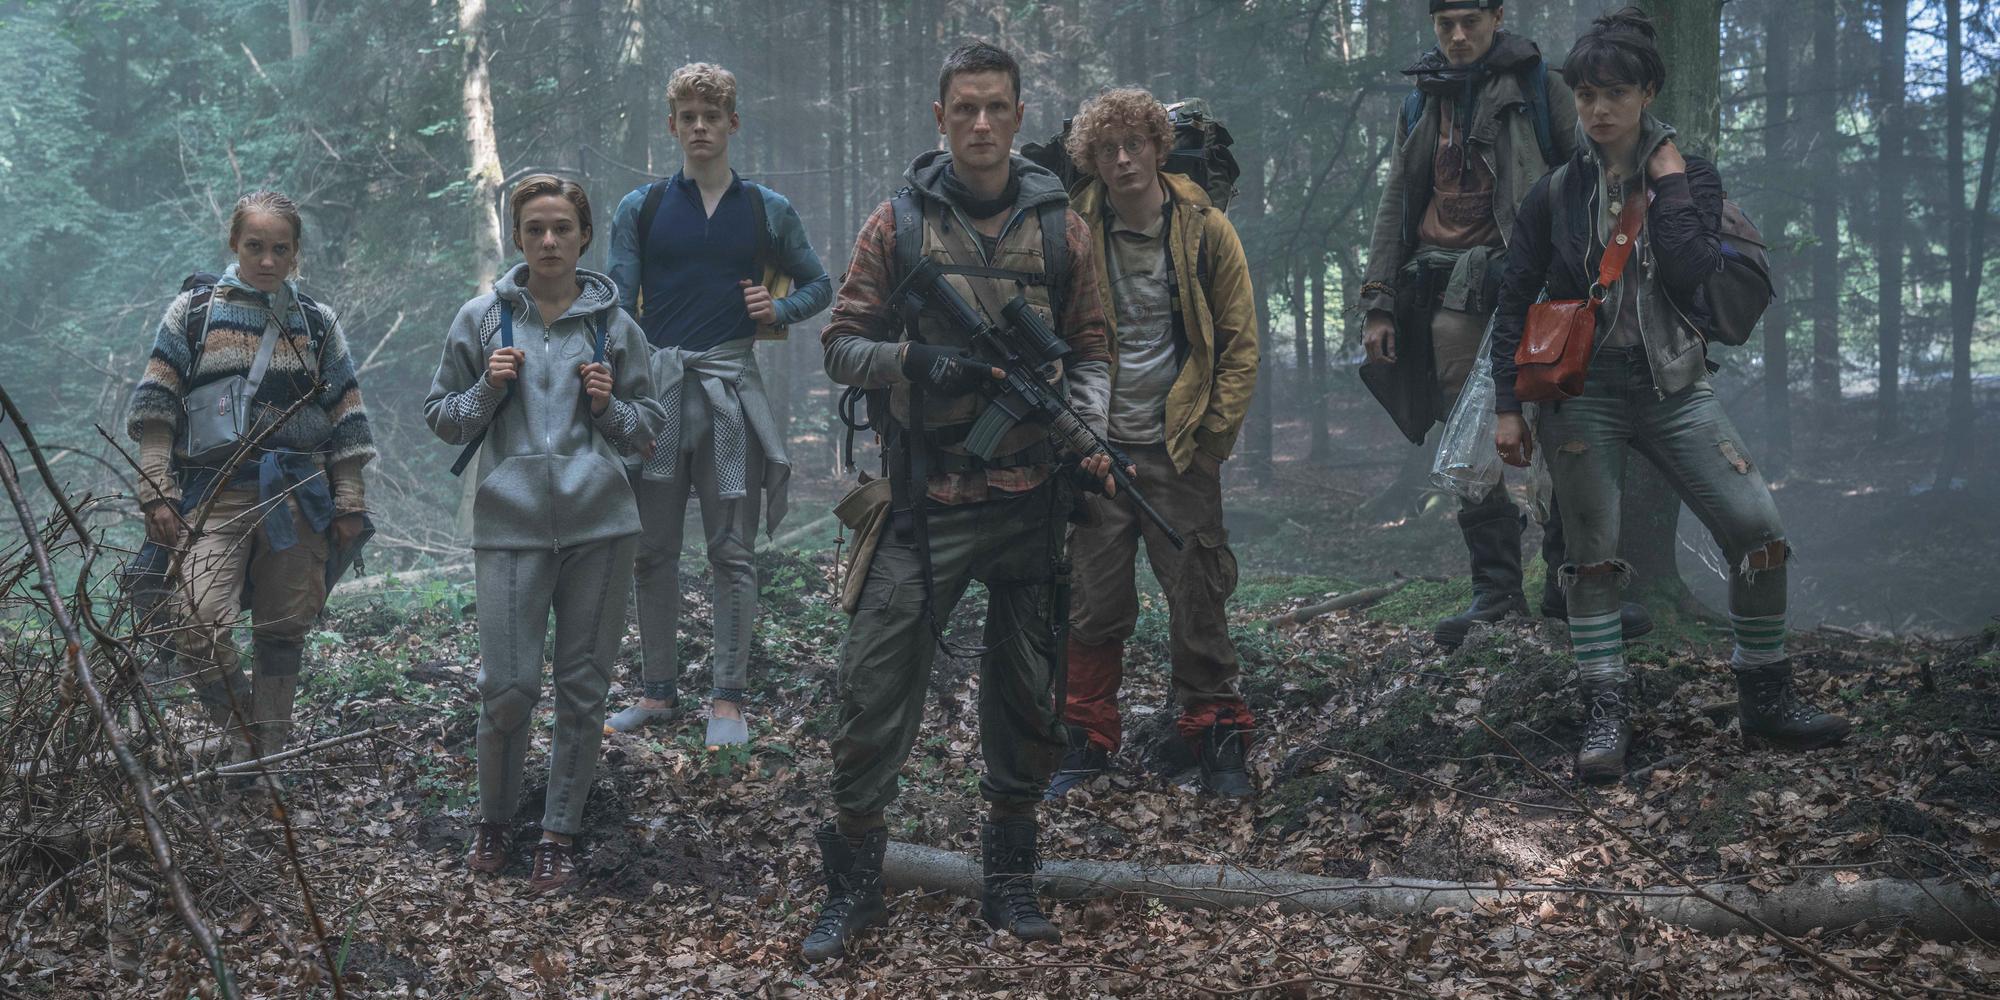 The Rain Cast Netflix